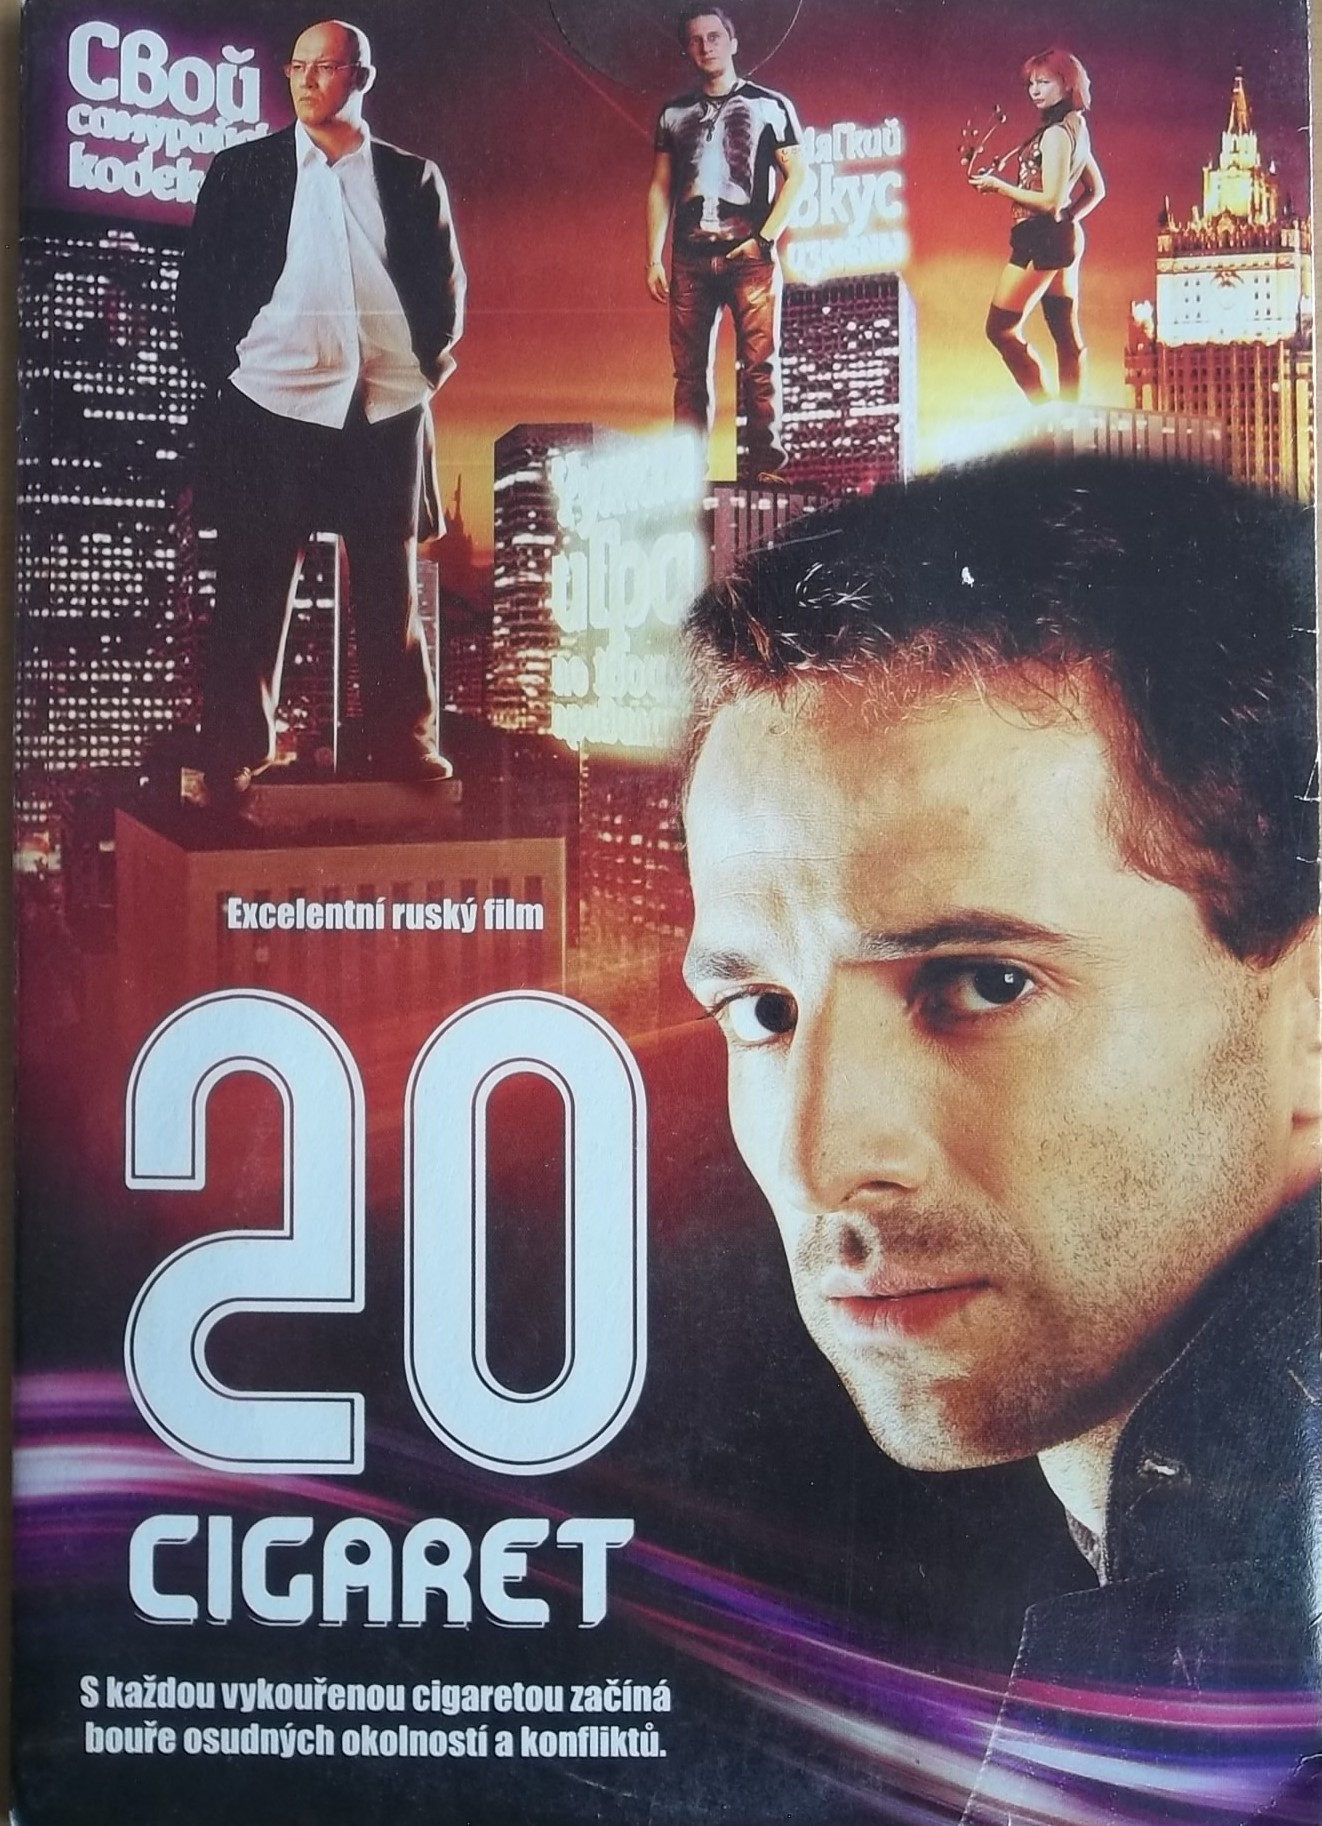 20 cigaret DVD